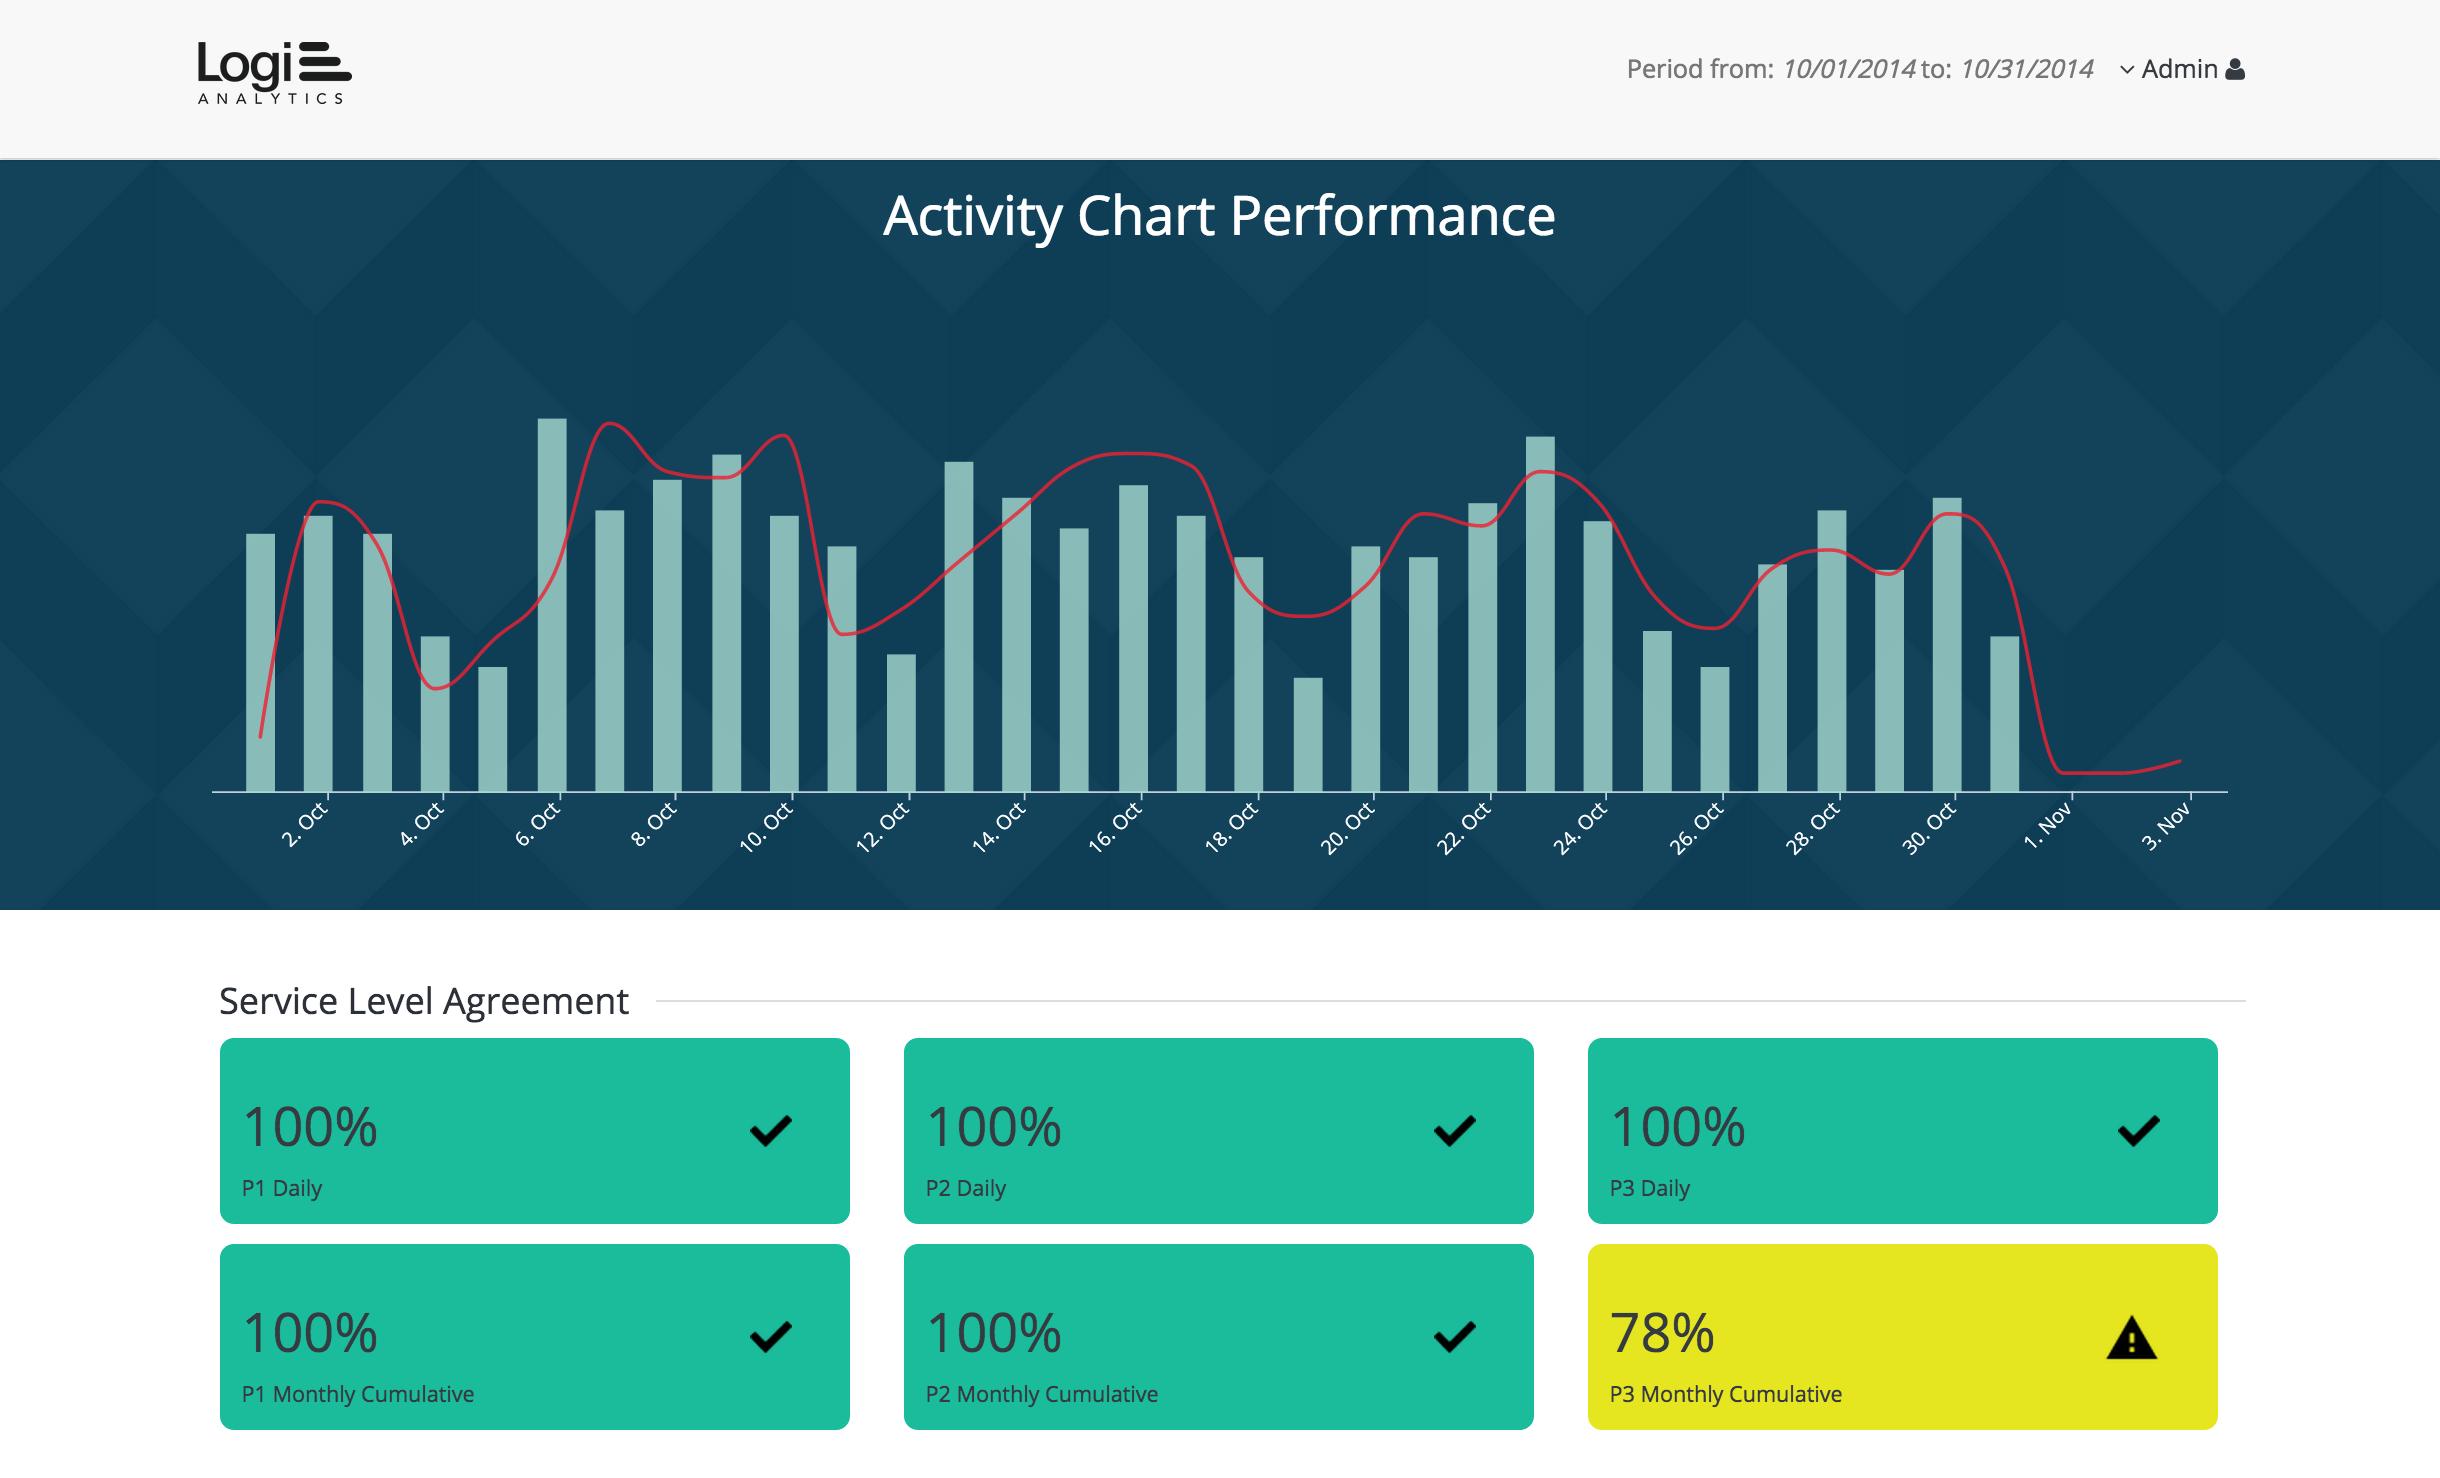 Logi Analytics facility management dashboard